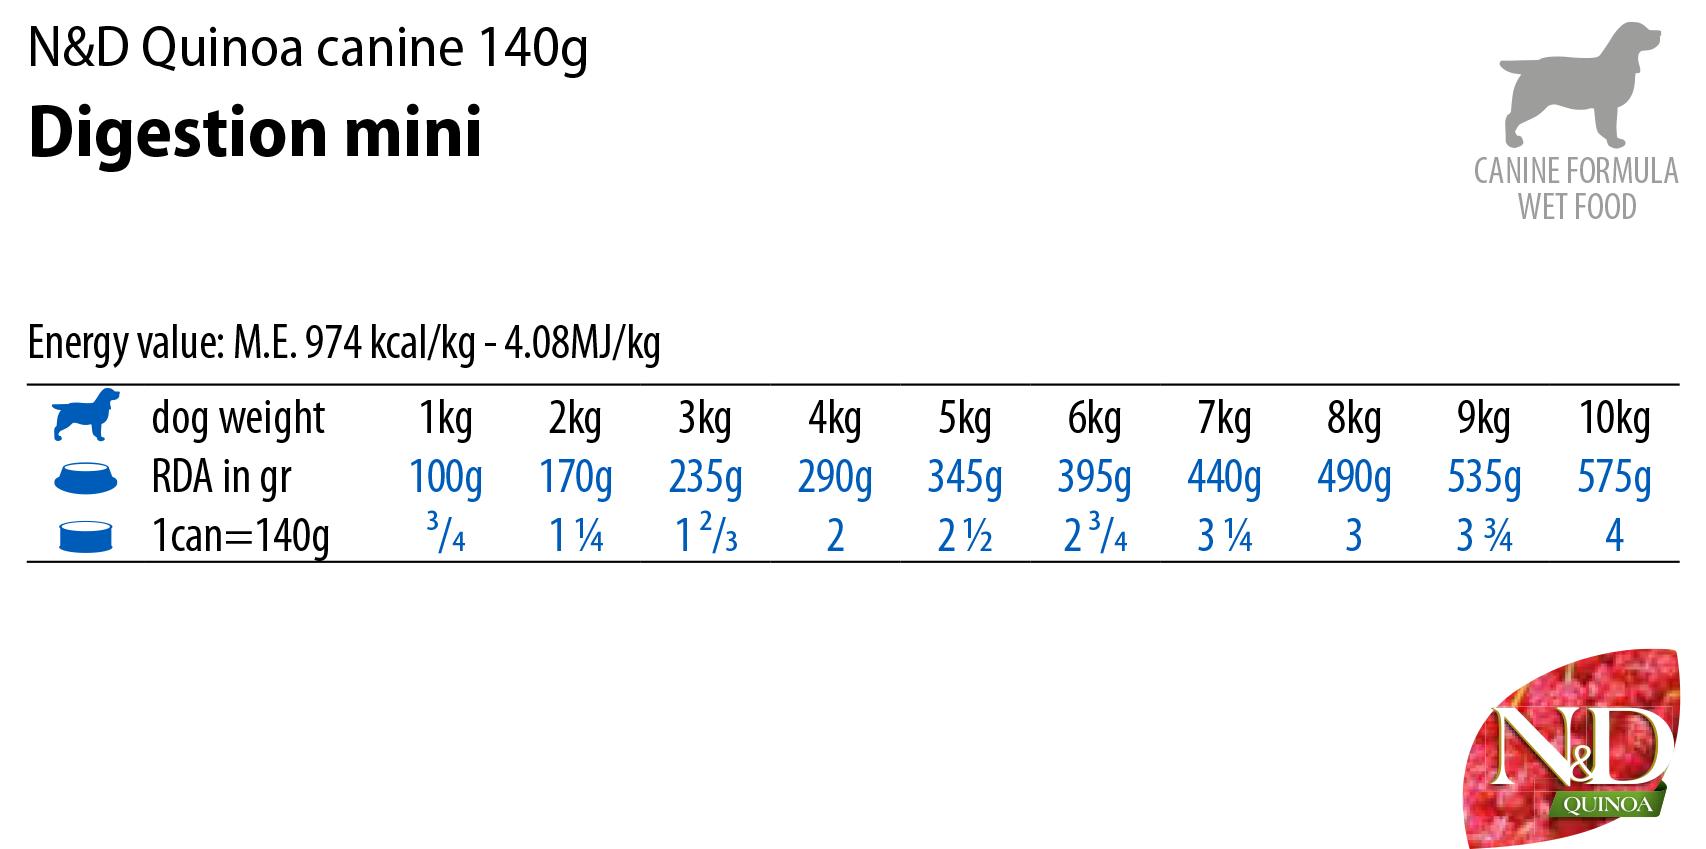 N&D Dog Wet GF Quinoa Digestion Mini